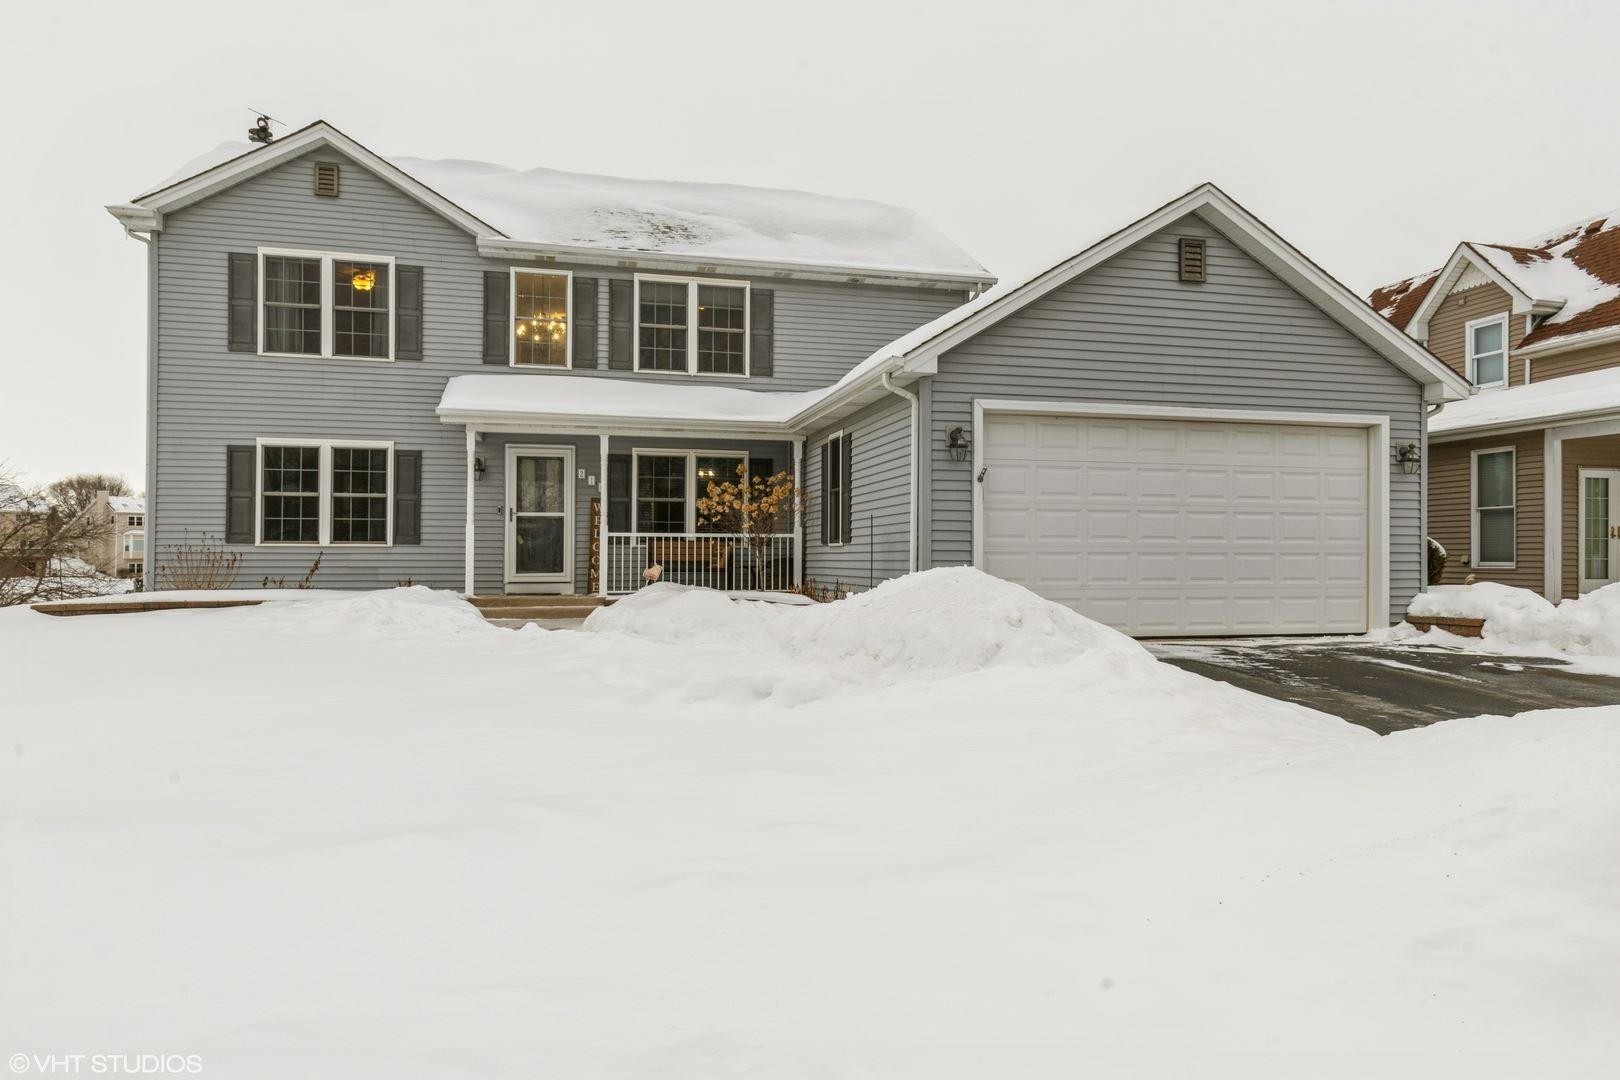 216 Midlane Drive, Crystal Lake, IL 60012 - #: 10996131